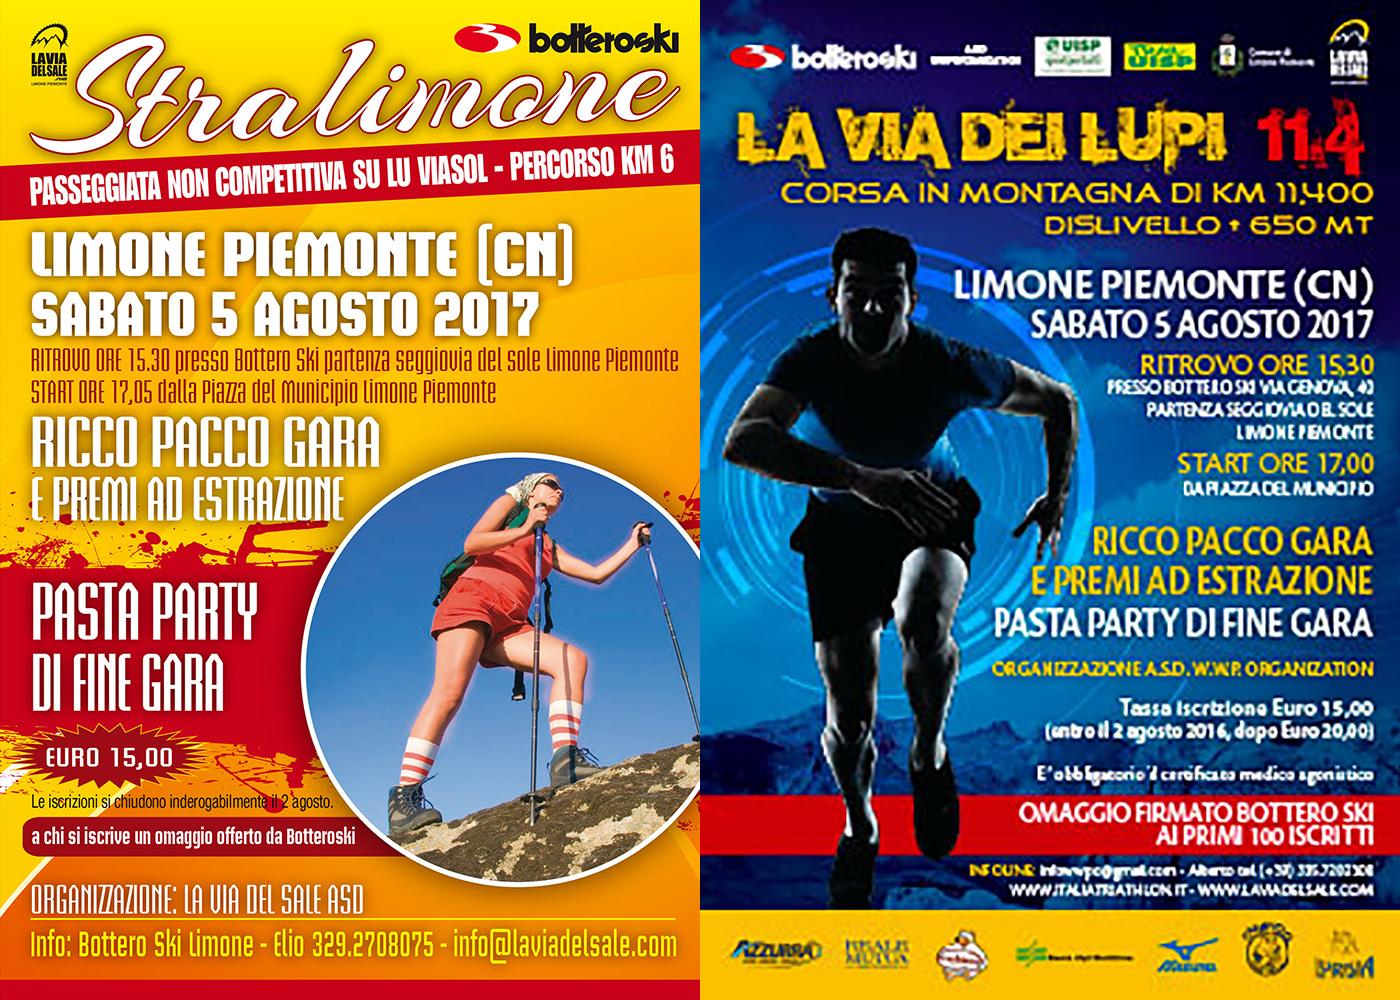 locandine-stralimone-via-dei-lupi-2017